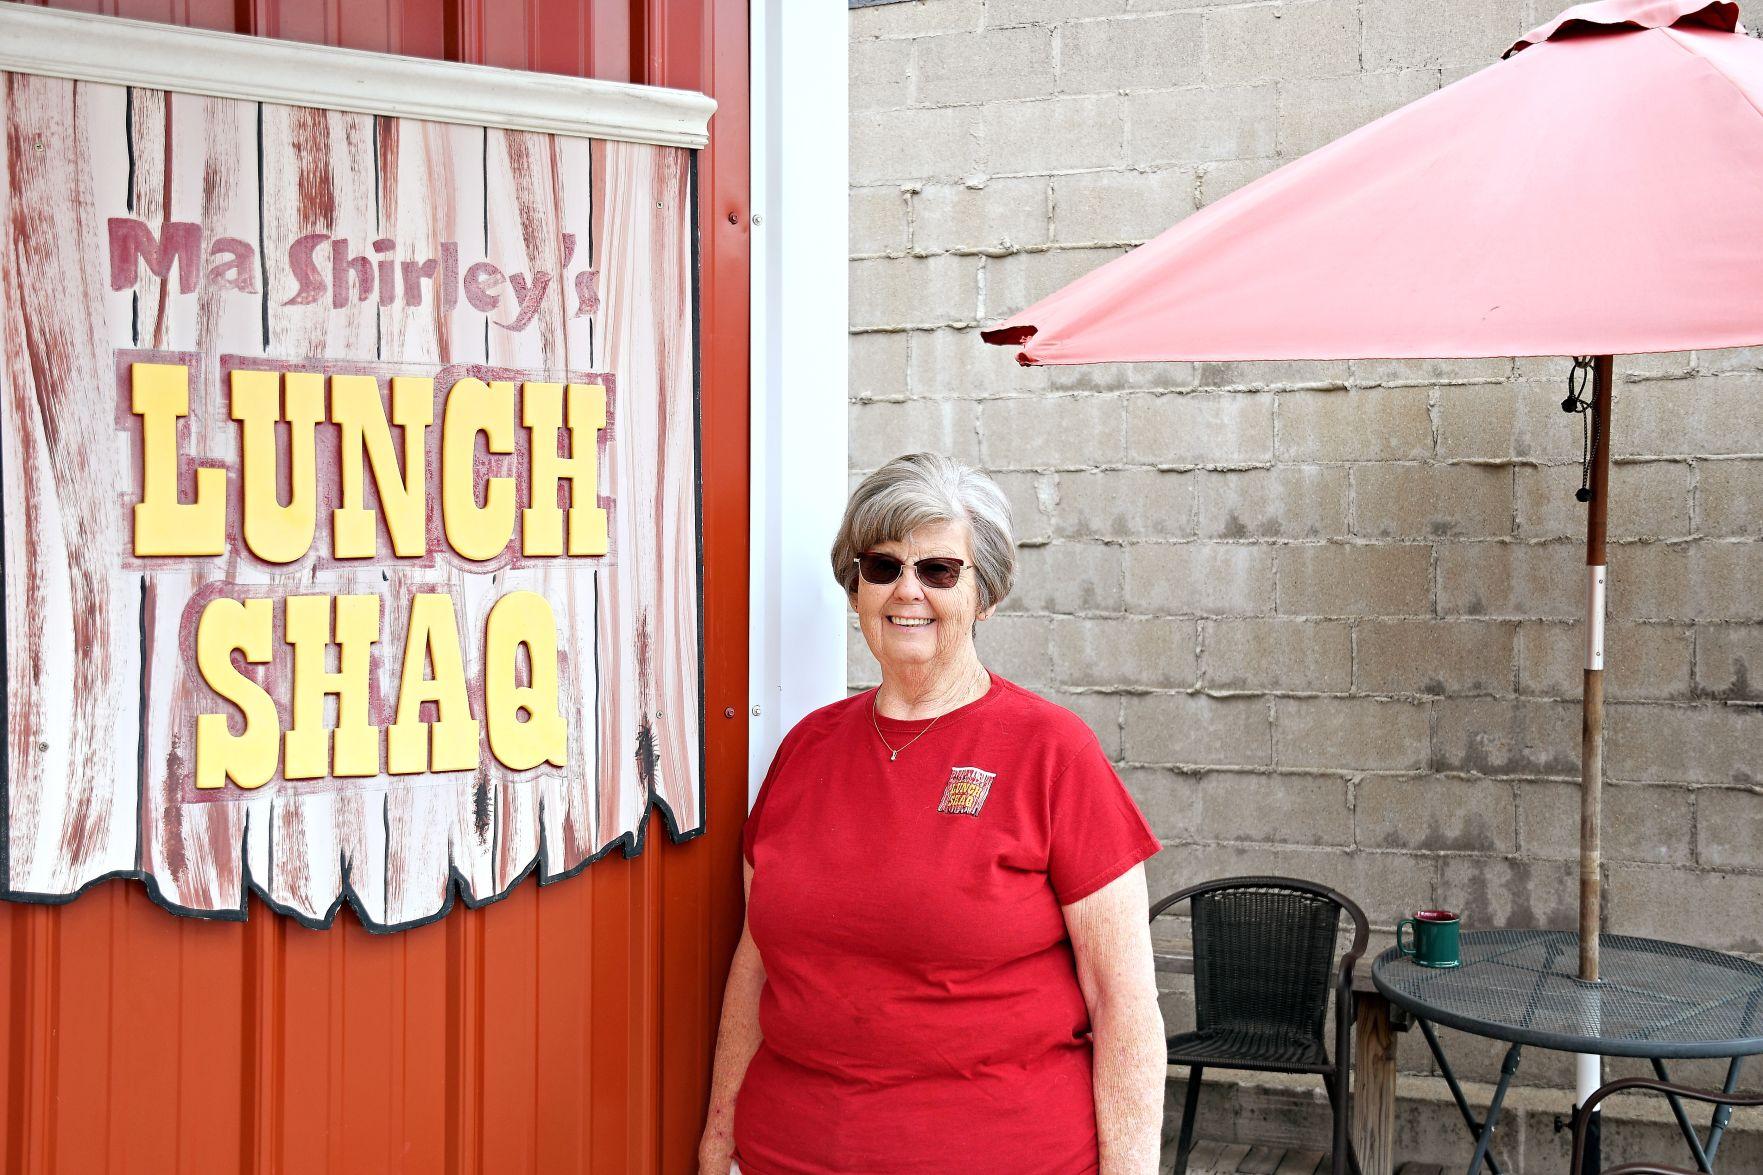 Ma Shirley's Lunch Shaq